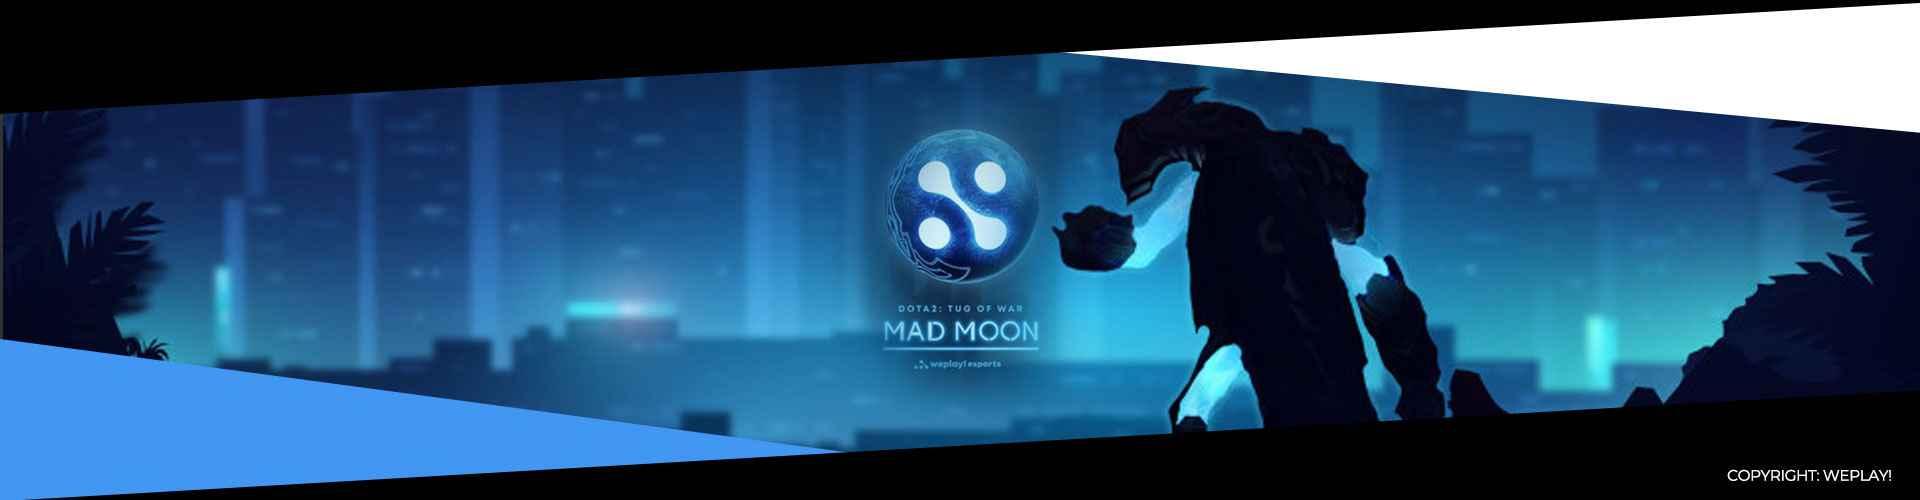 Dota 2 - WePlay! Tug of War: Mad Moon 2020